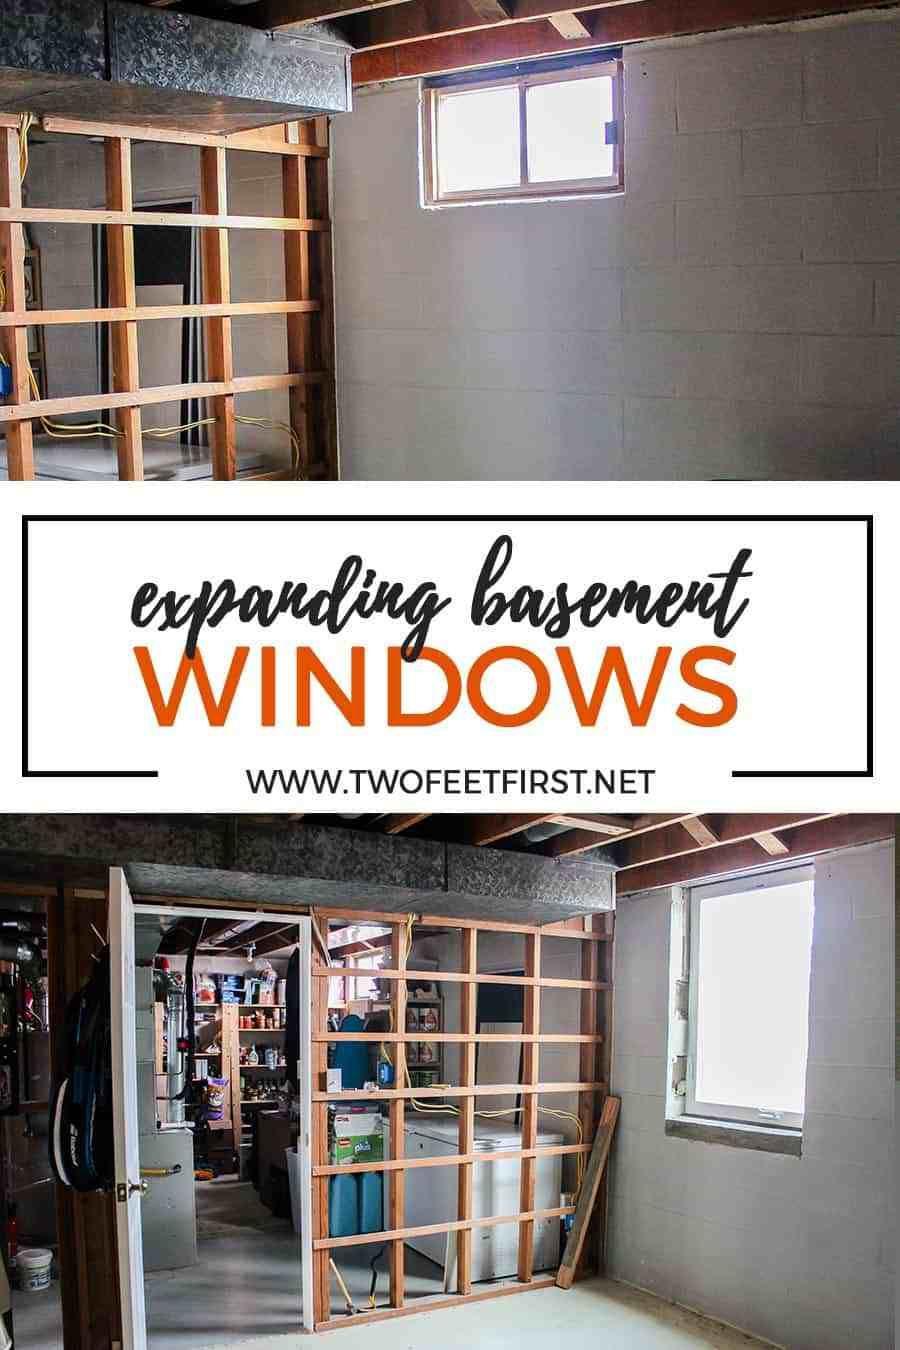 Photo of The process of enlarging basement windows